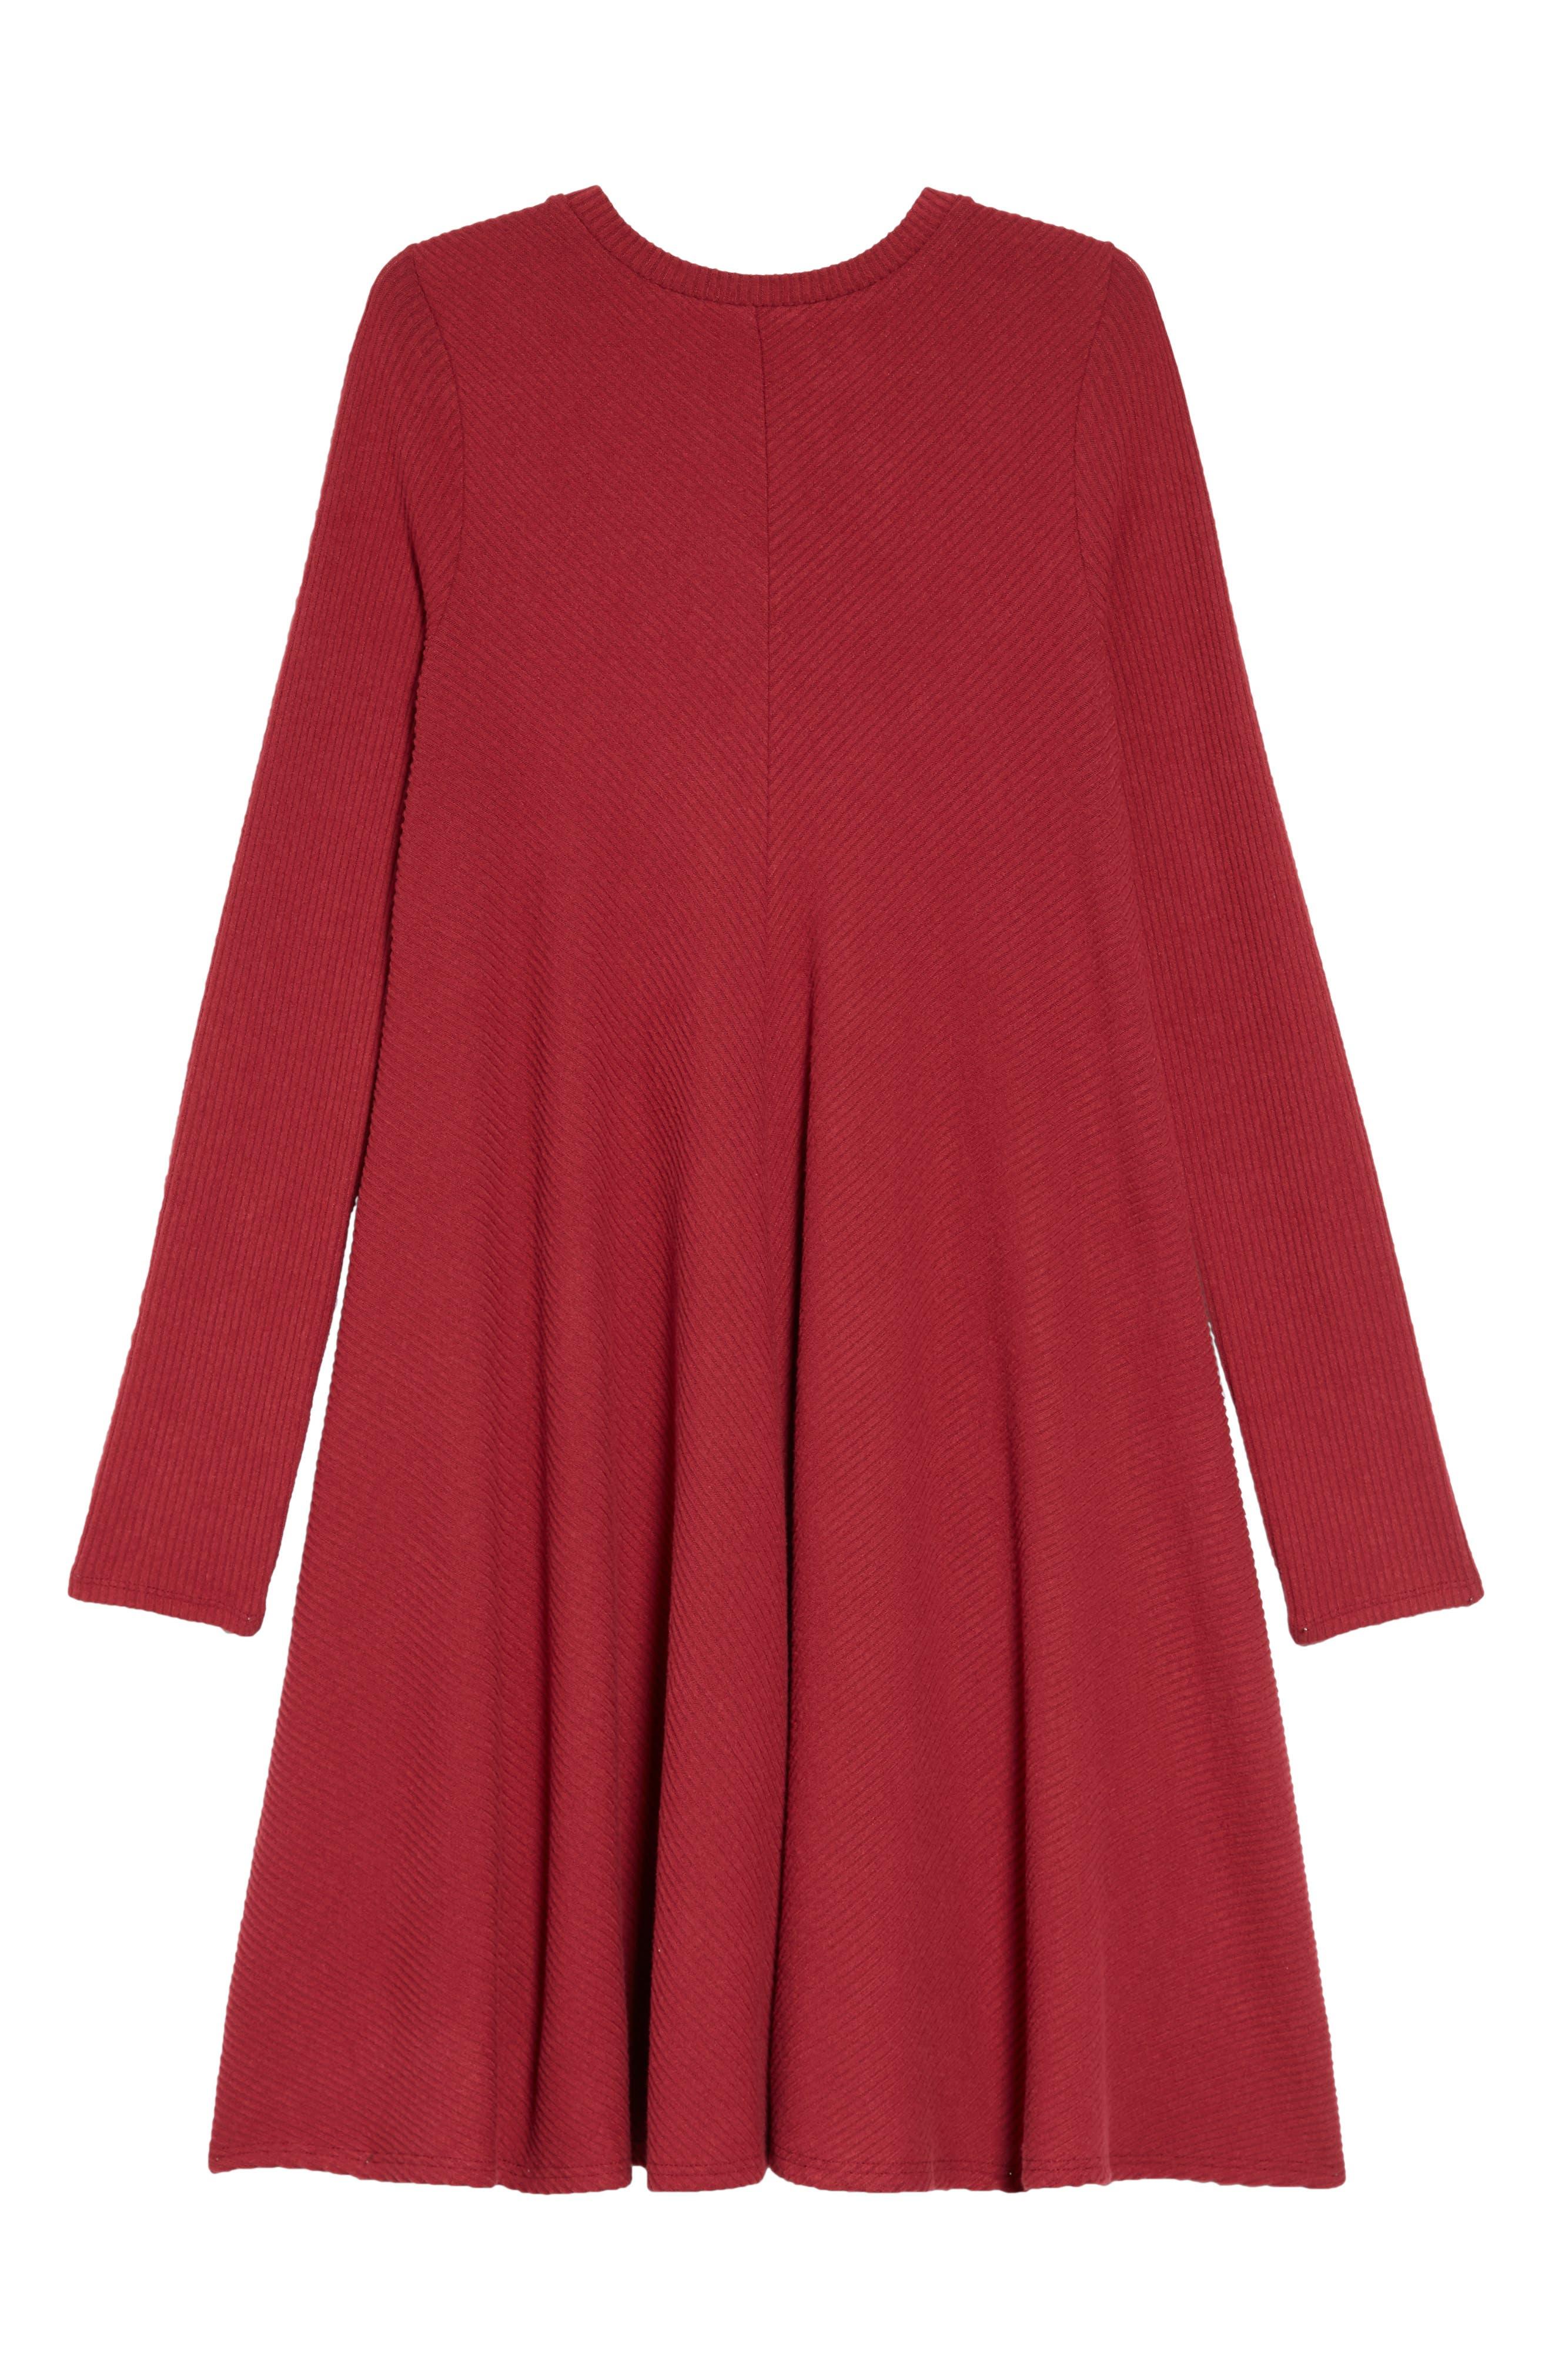 Tucker + Take Swing Dress,                         Main,                         color, RED TIBETAN